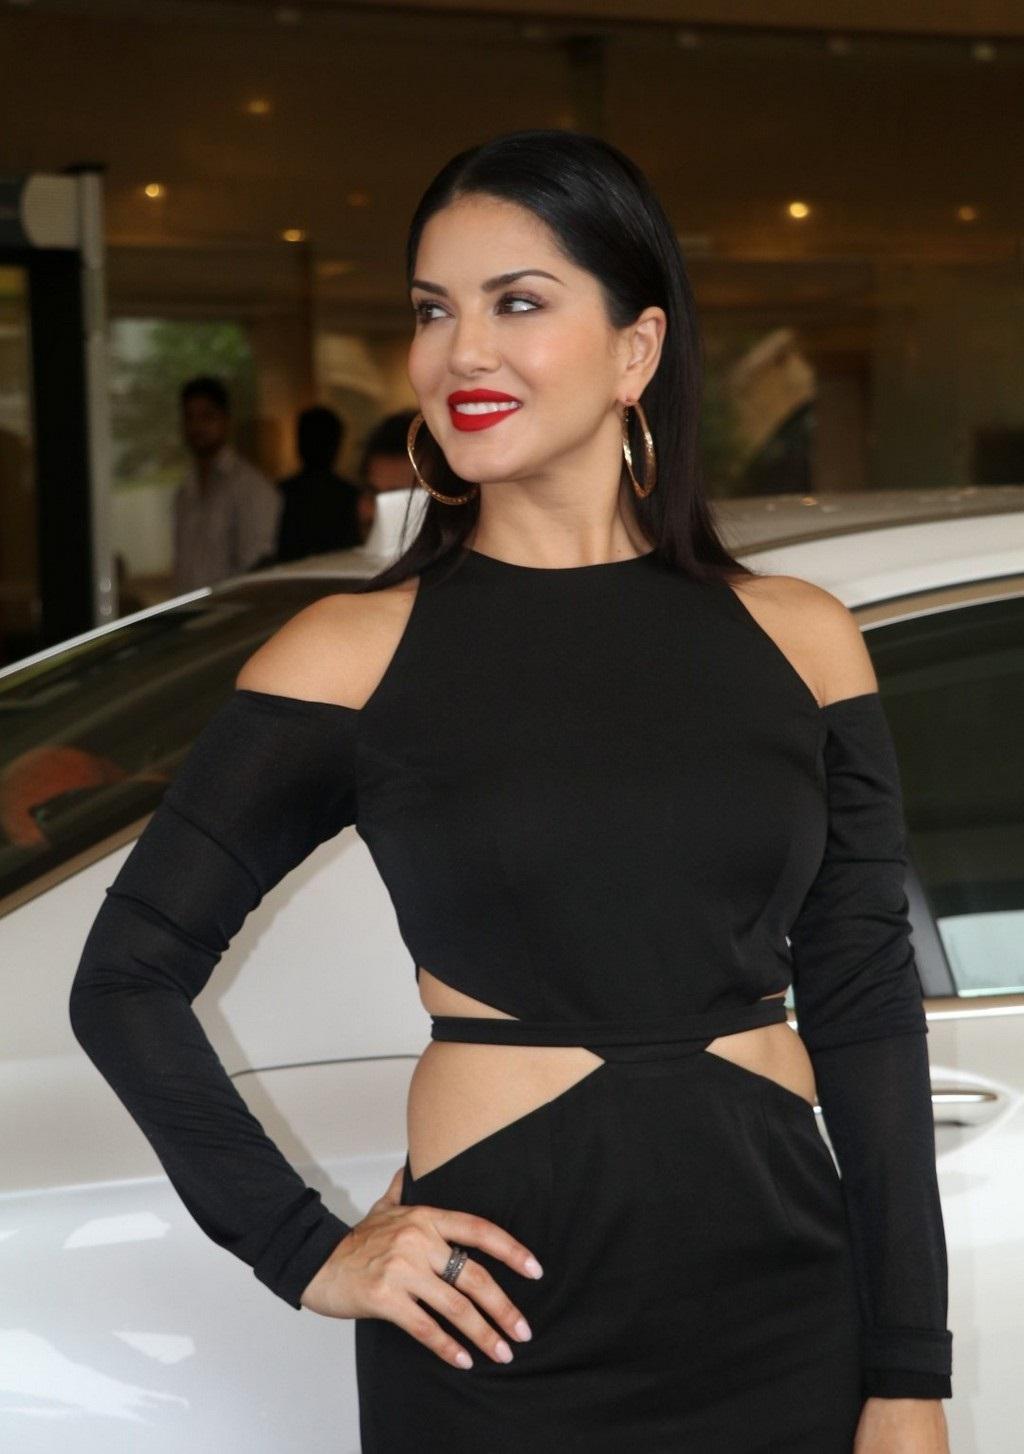 Bollywood Actress Sunny Leone Hot Legs Show Stills In Black Dress